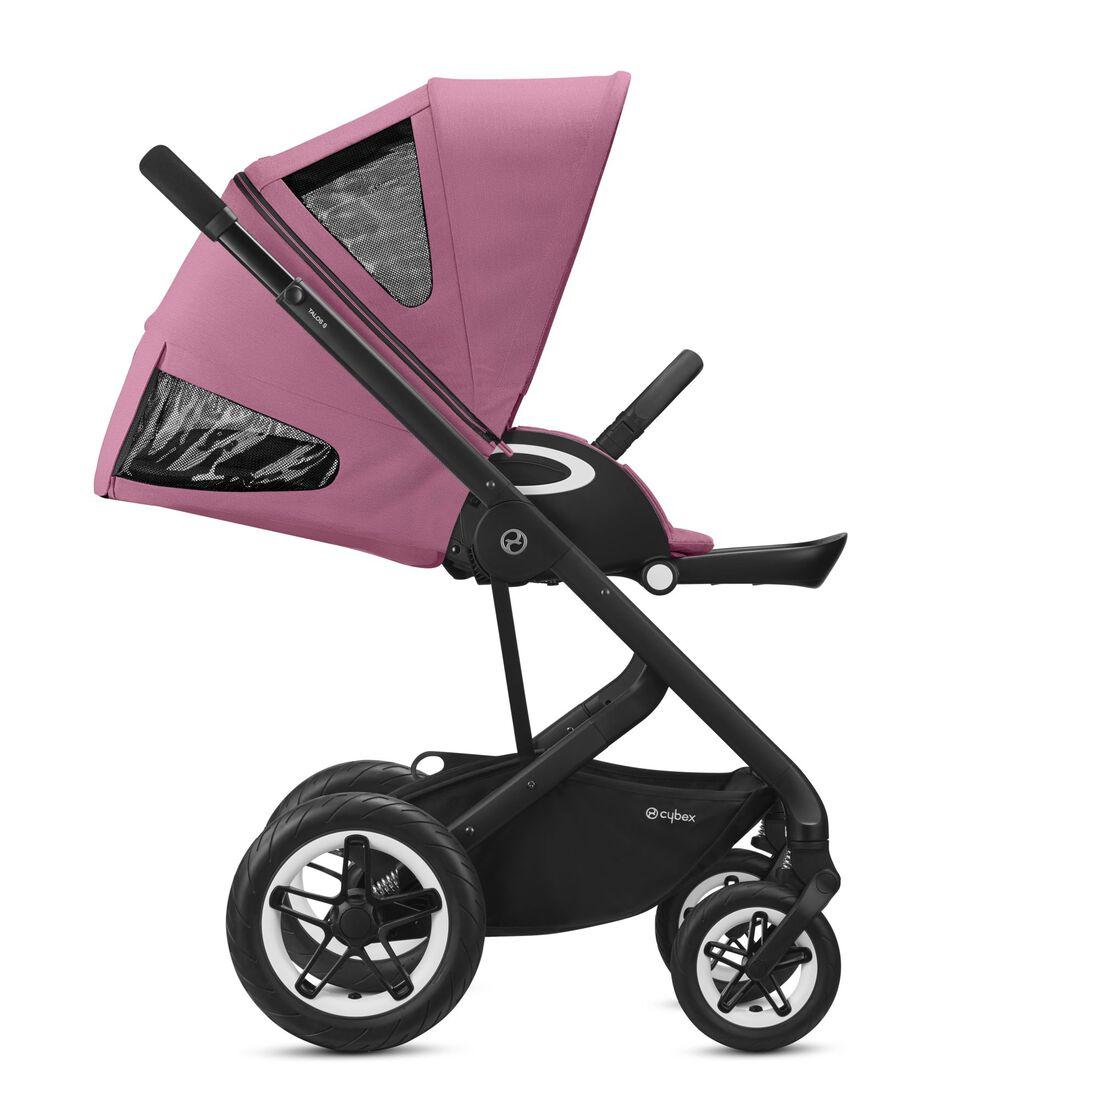 CYBEX Talos S Lux - Magnolia Pink (Black Frame) in Magnolia Pink (Black Frame) large image number 4